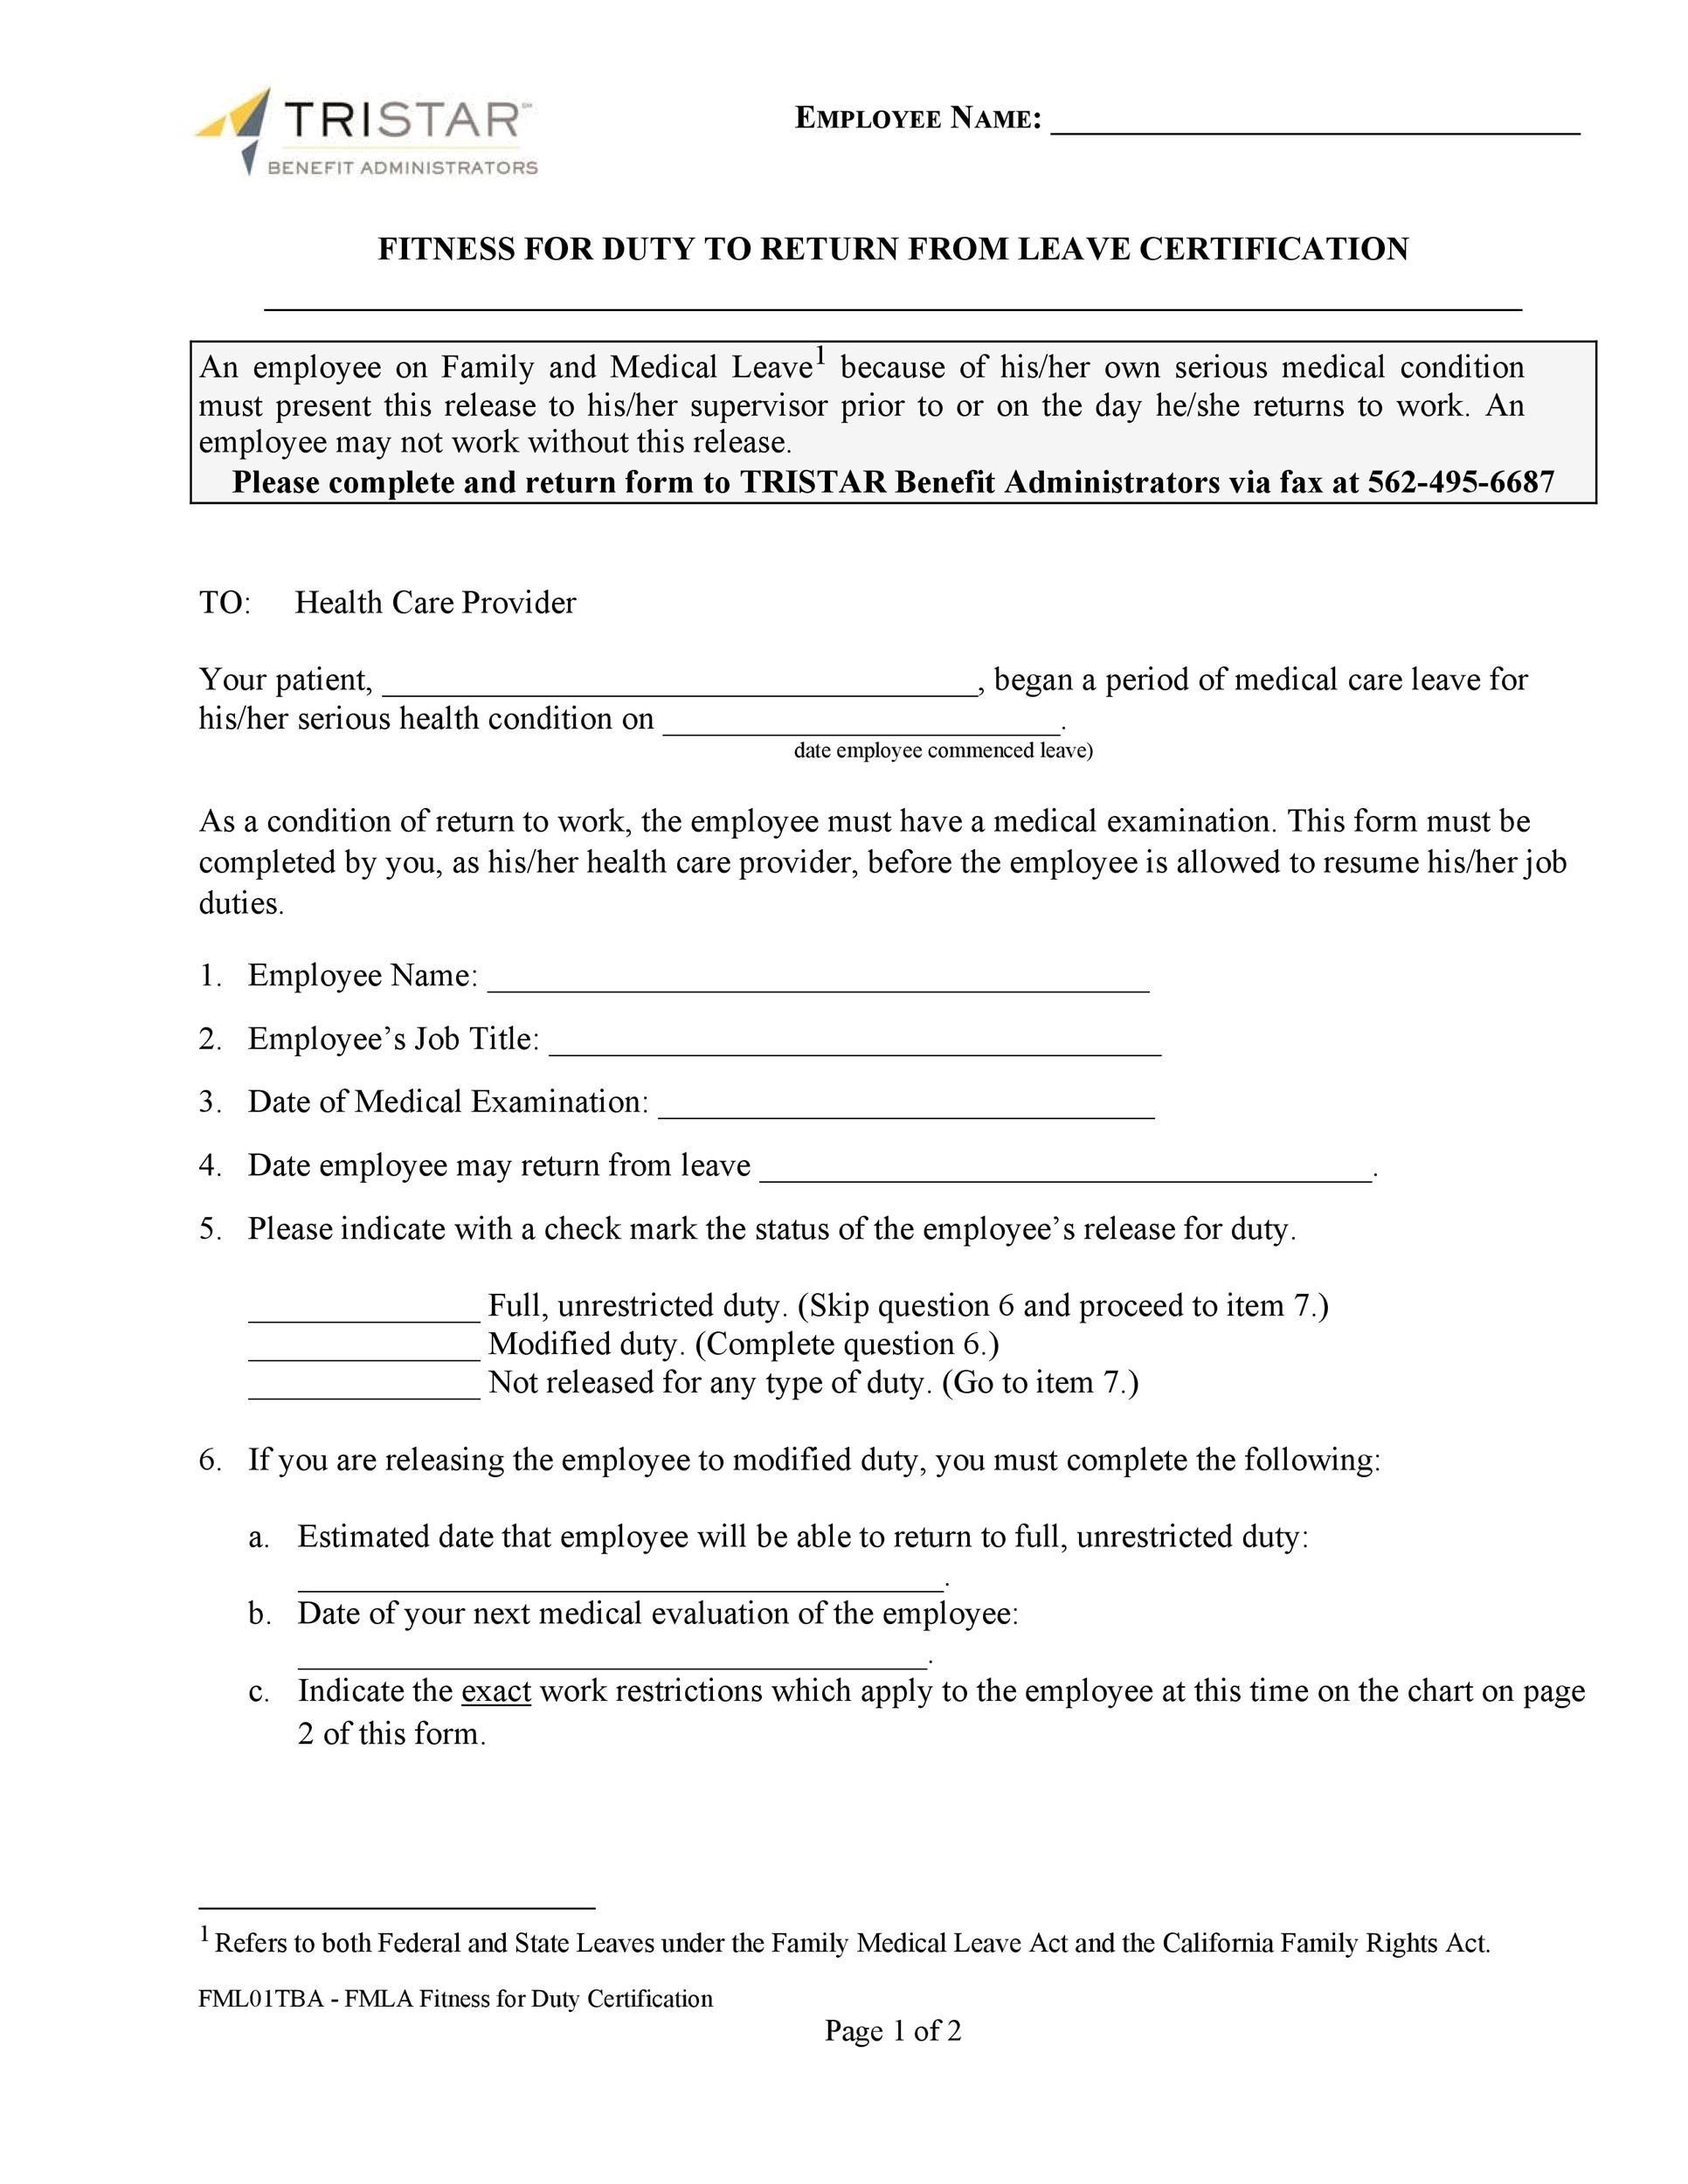 Free return to work form 34